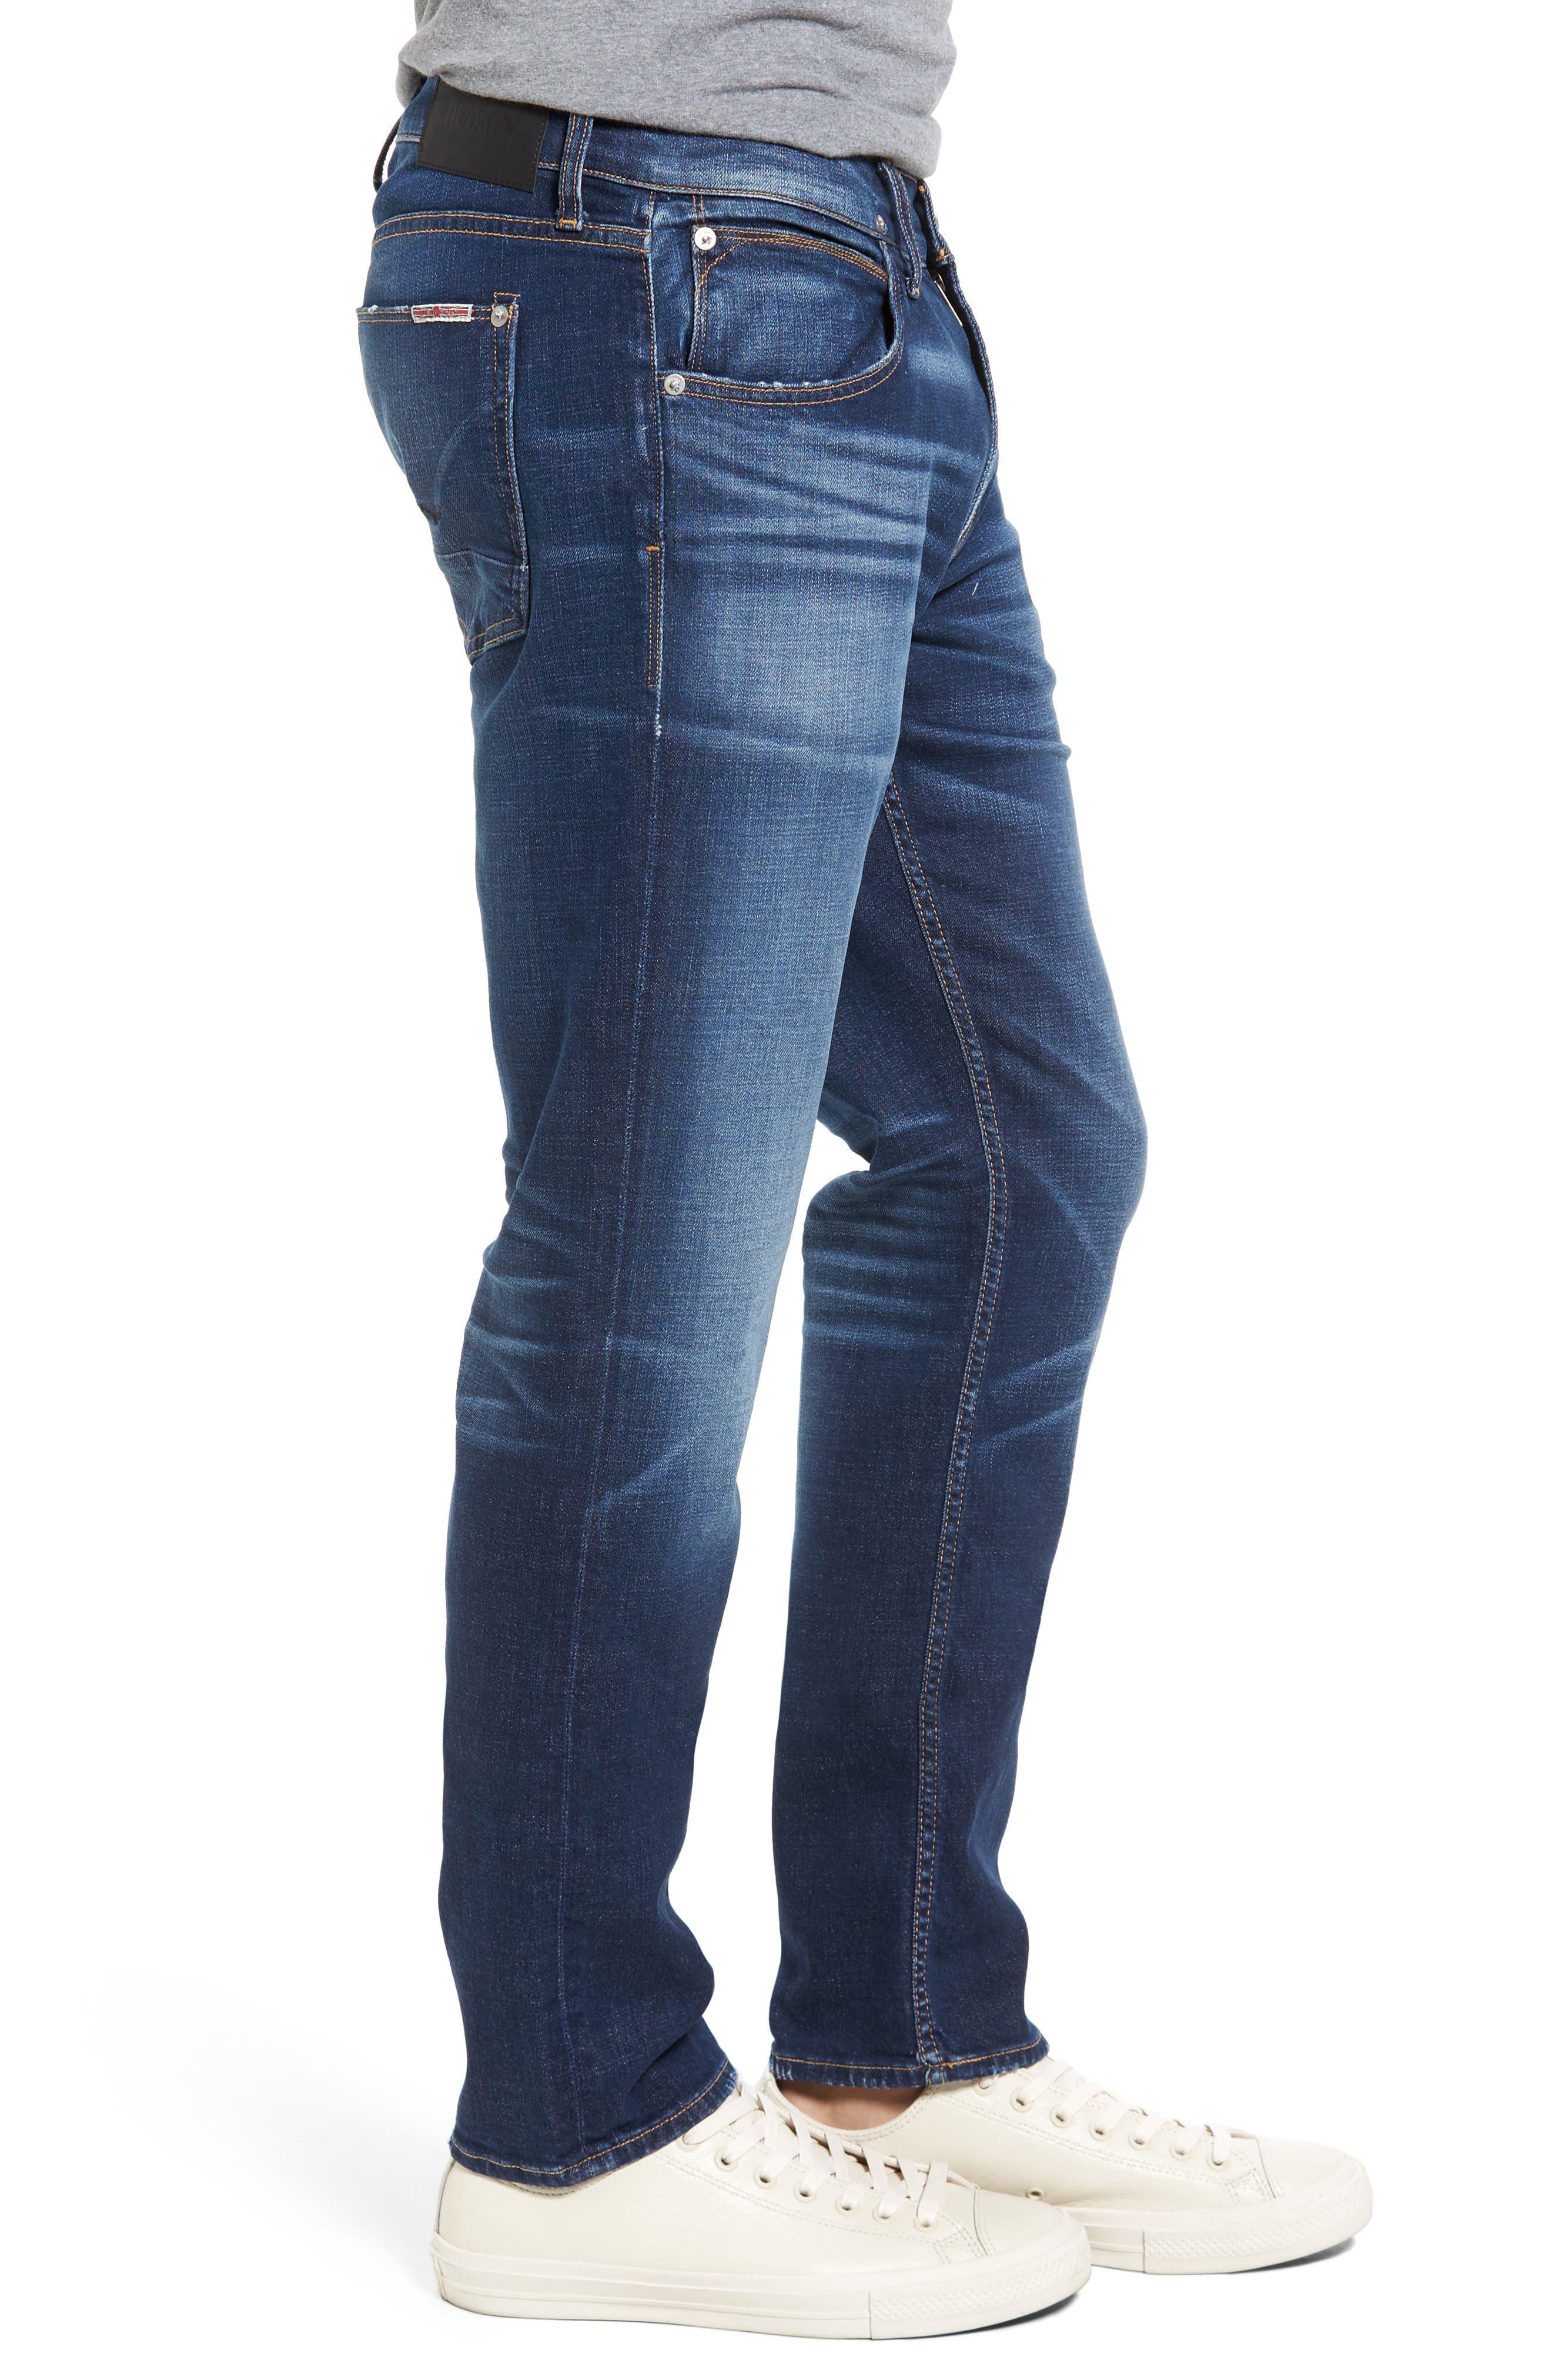 Blake Slim Fit Jeans,                             Alternate thumbnail 3, color,                             426